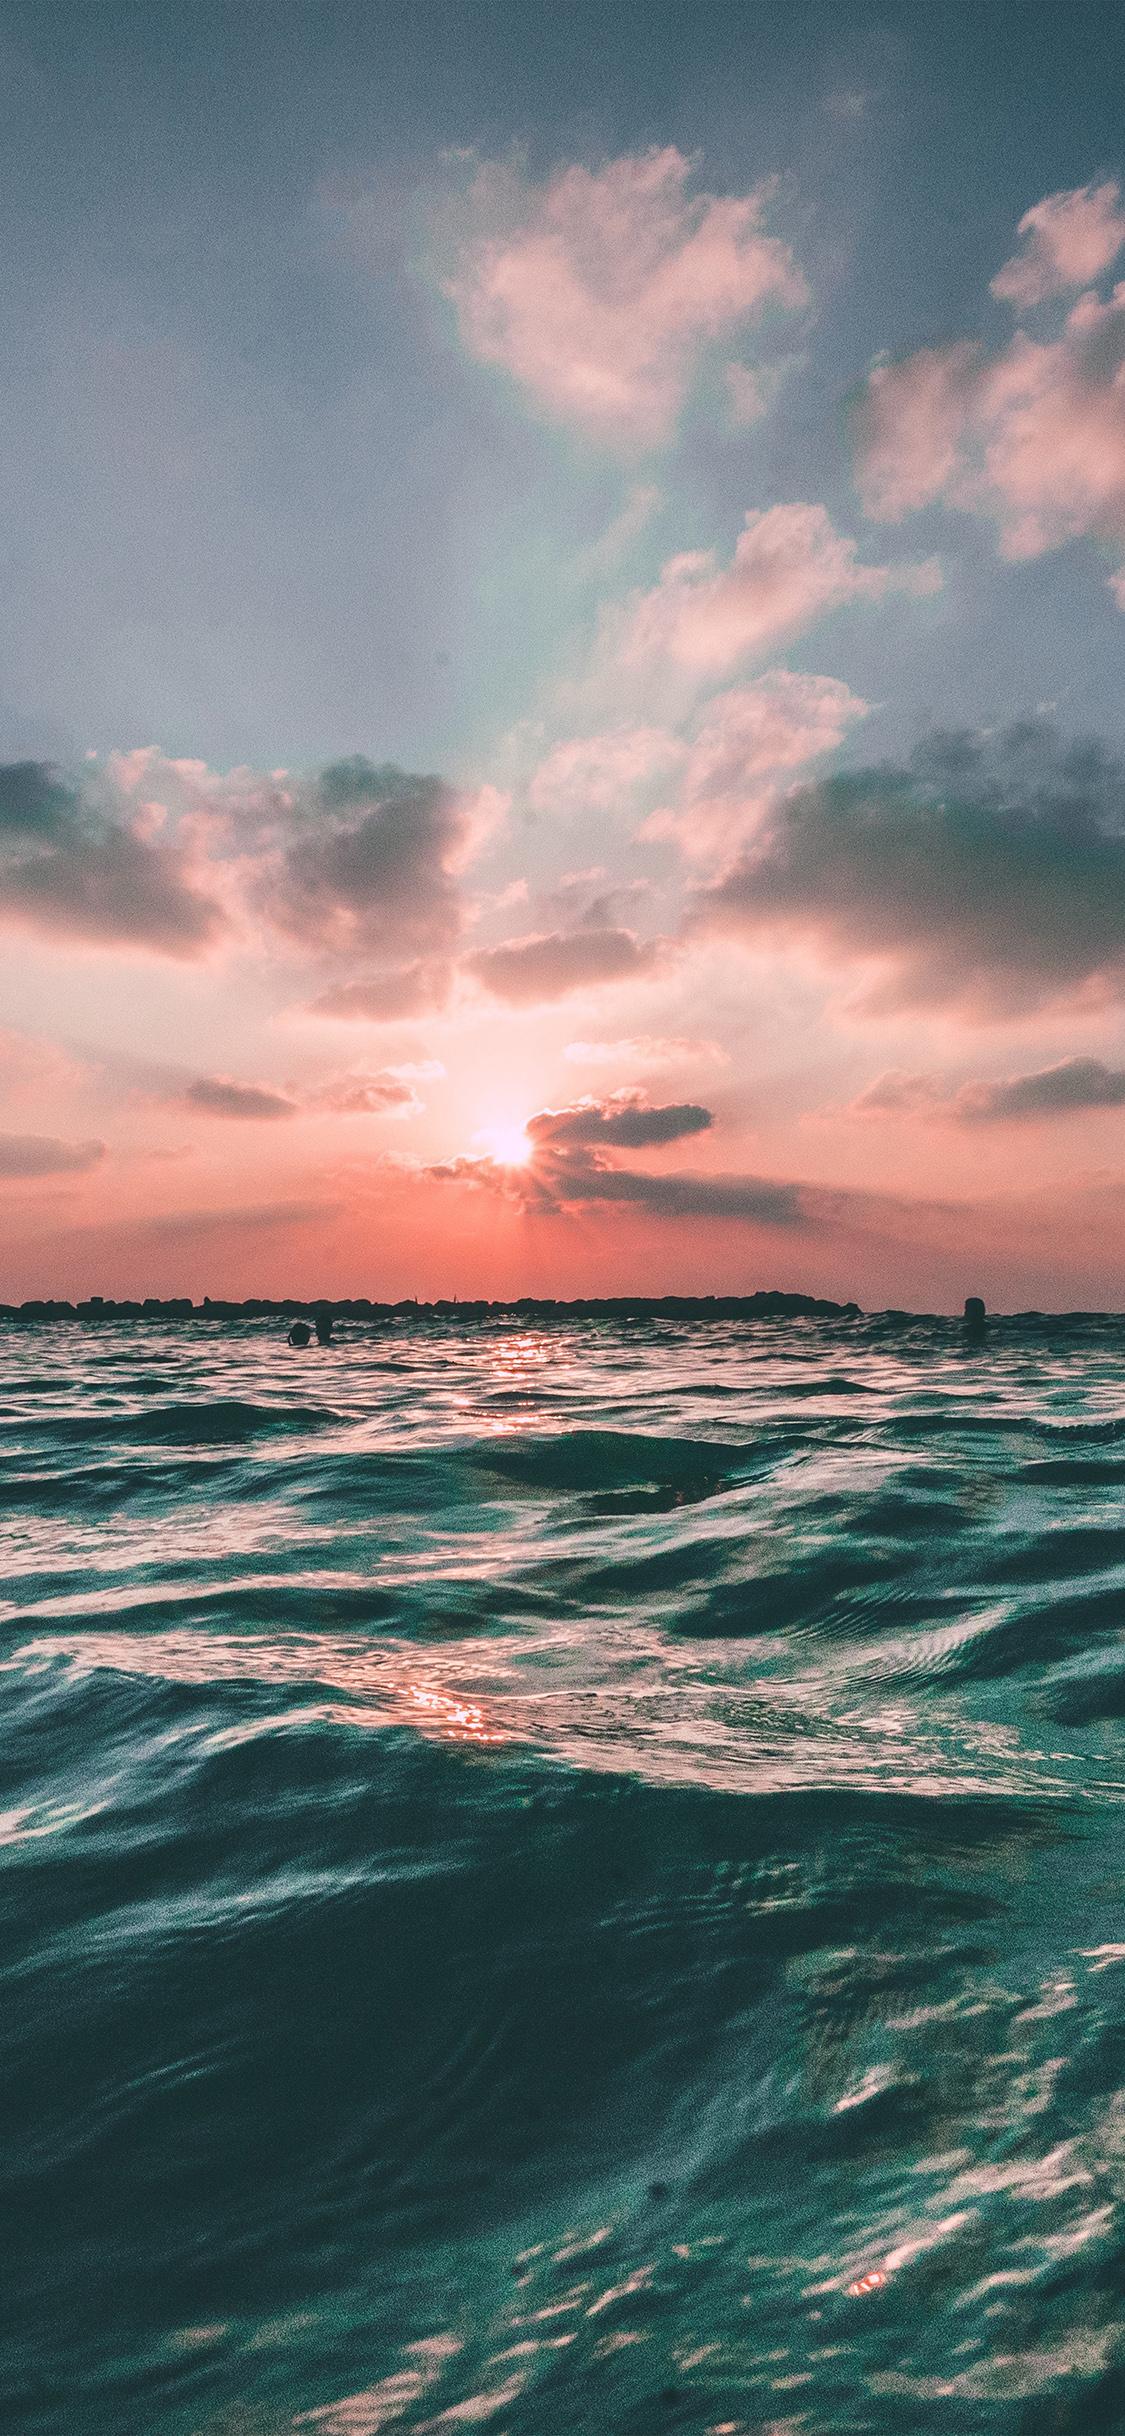 Disney Iphone X Wallpaper Nf43 Sunset Sea Sky Ocean Summer Green Water Nature Wallpaper